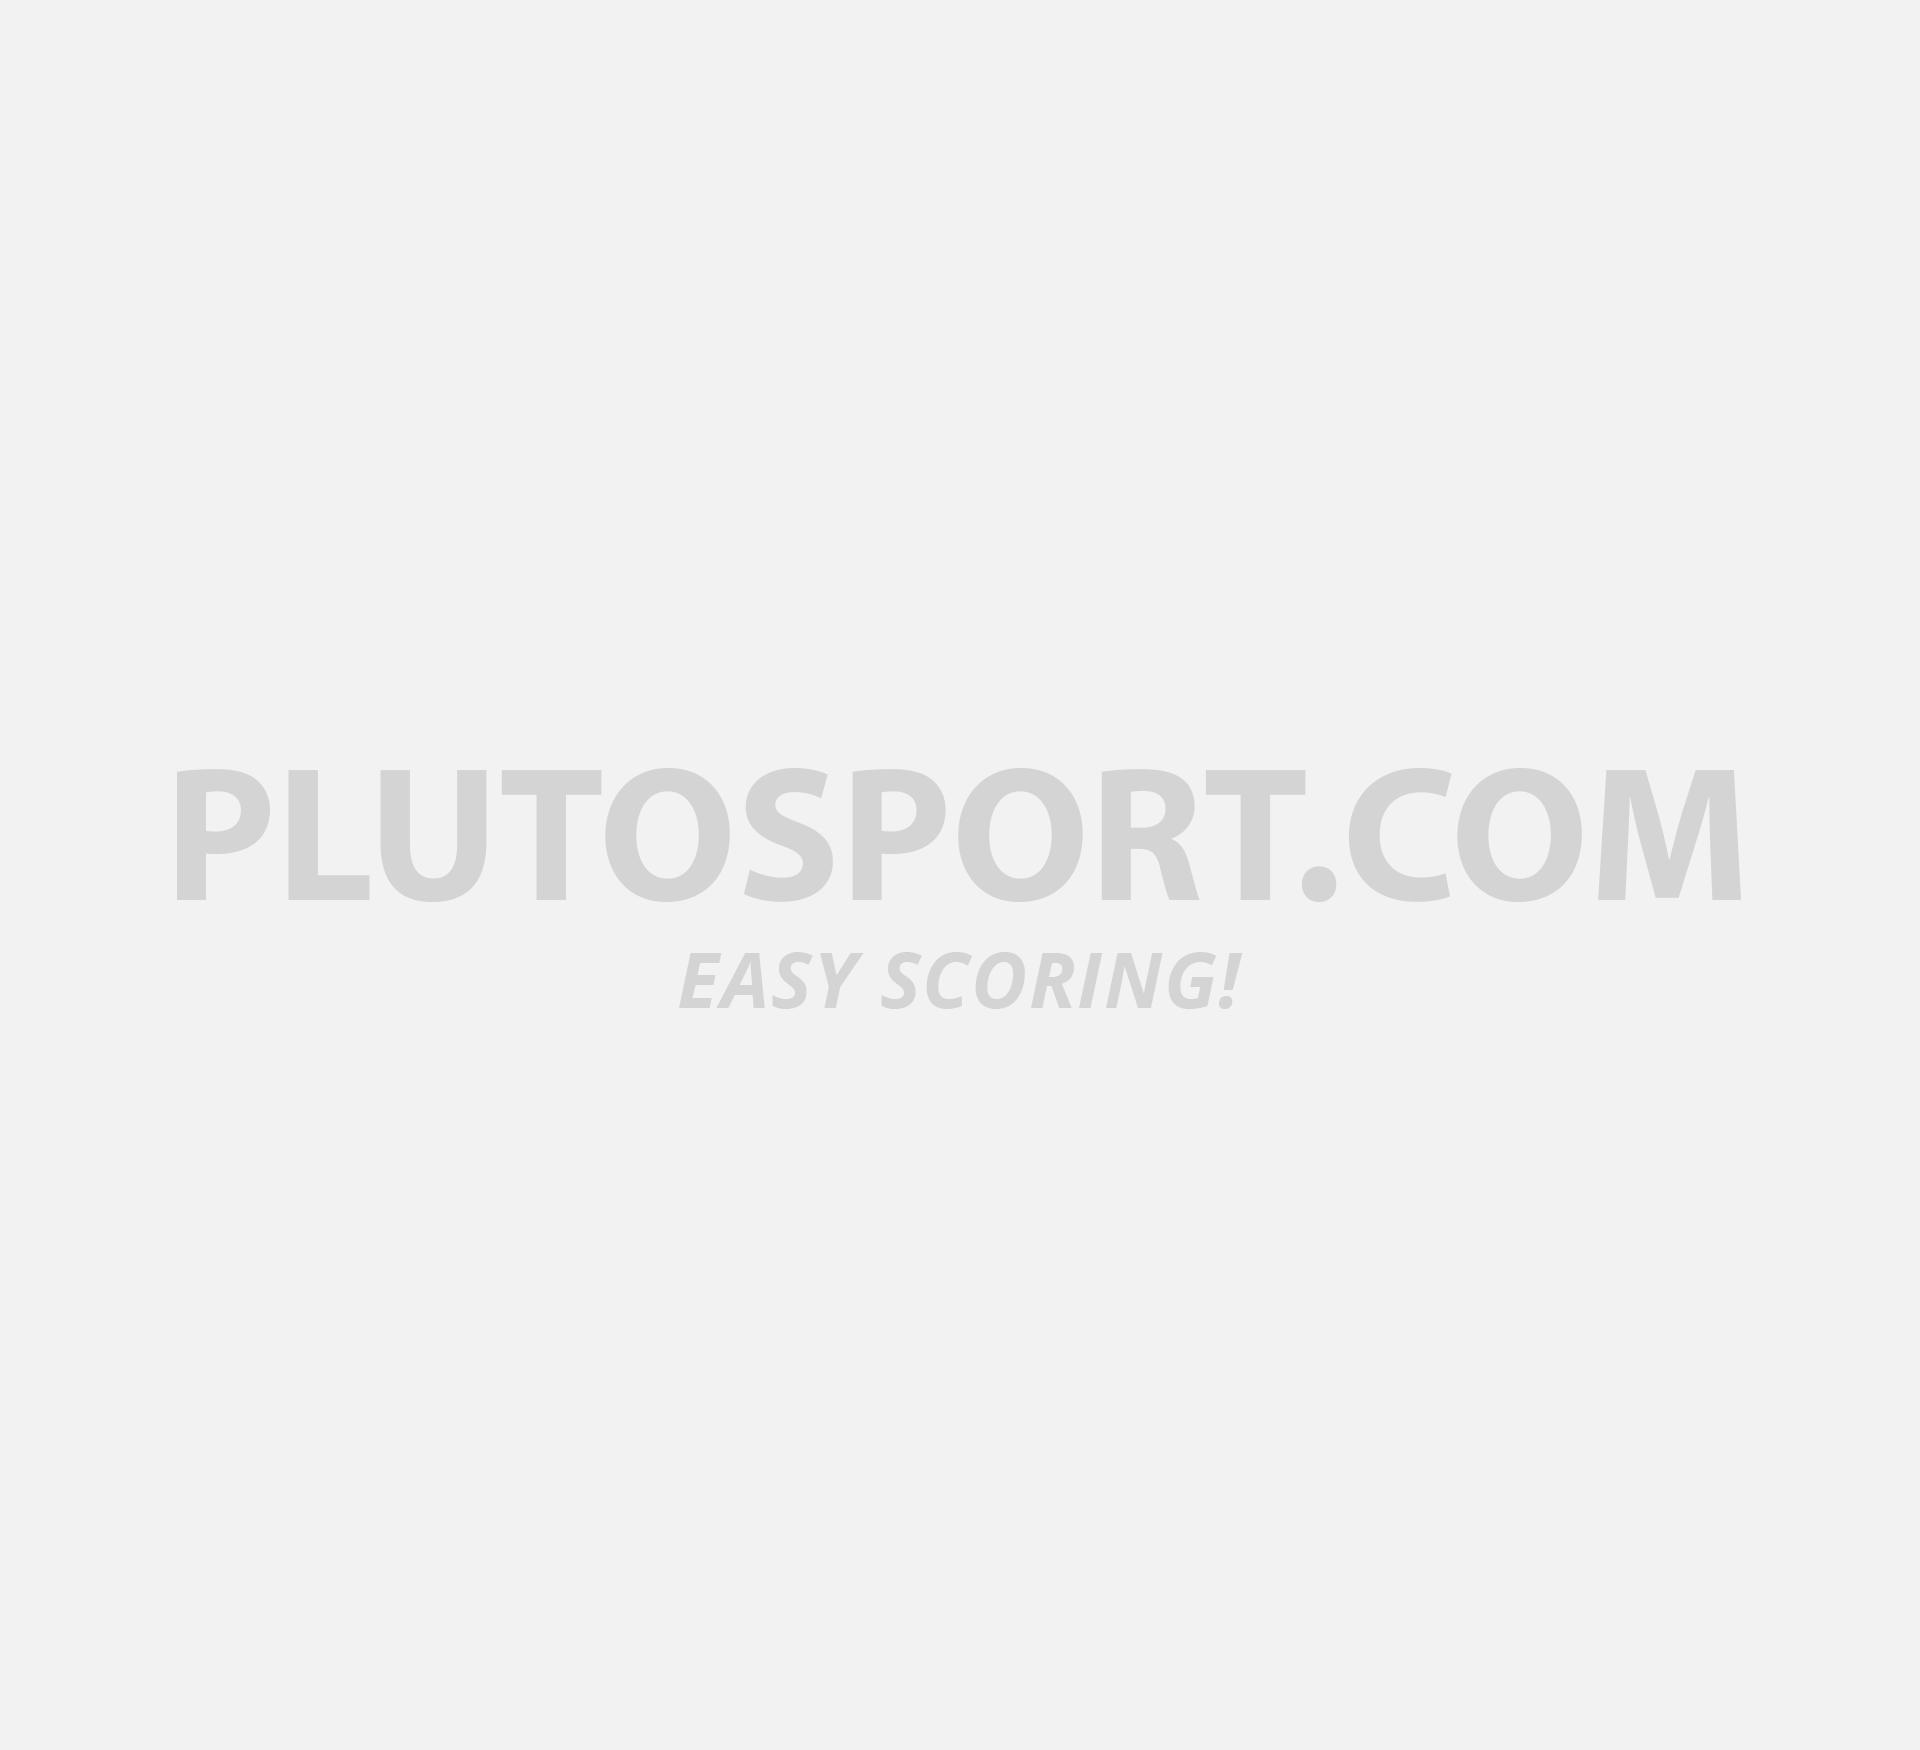 8b90dbb2aae Adidas ClimaCool 365 Short Mens - Shorts - Clothing - Fitness - Sports |  Plutosport